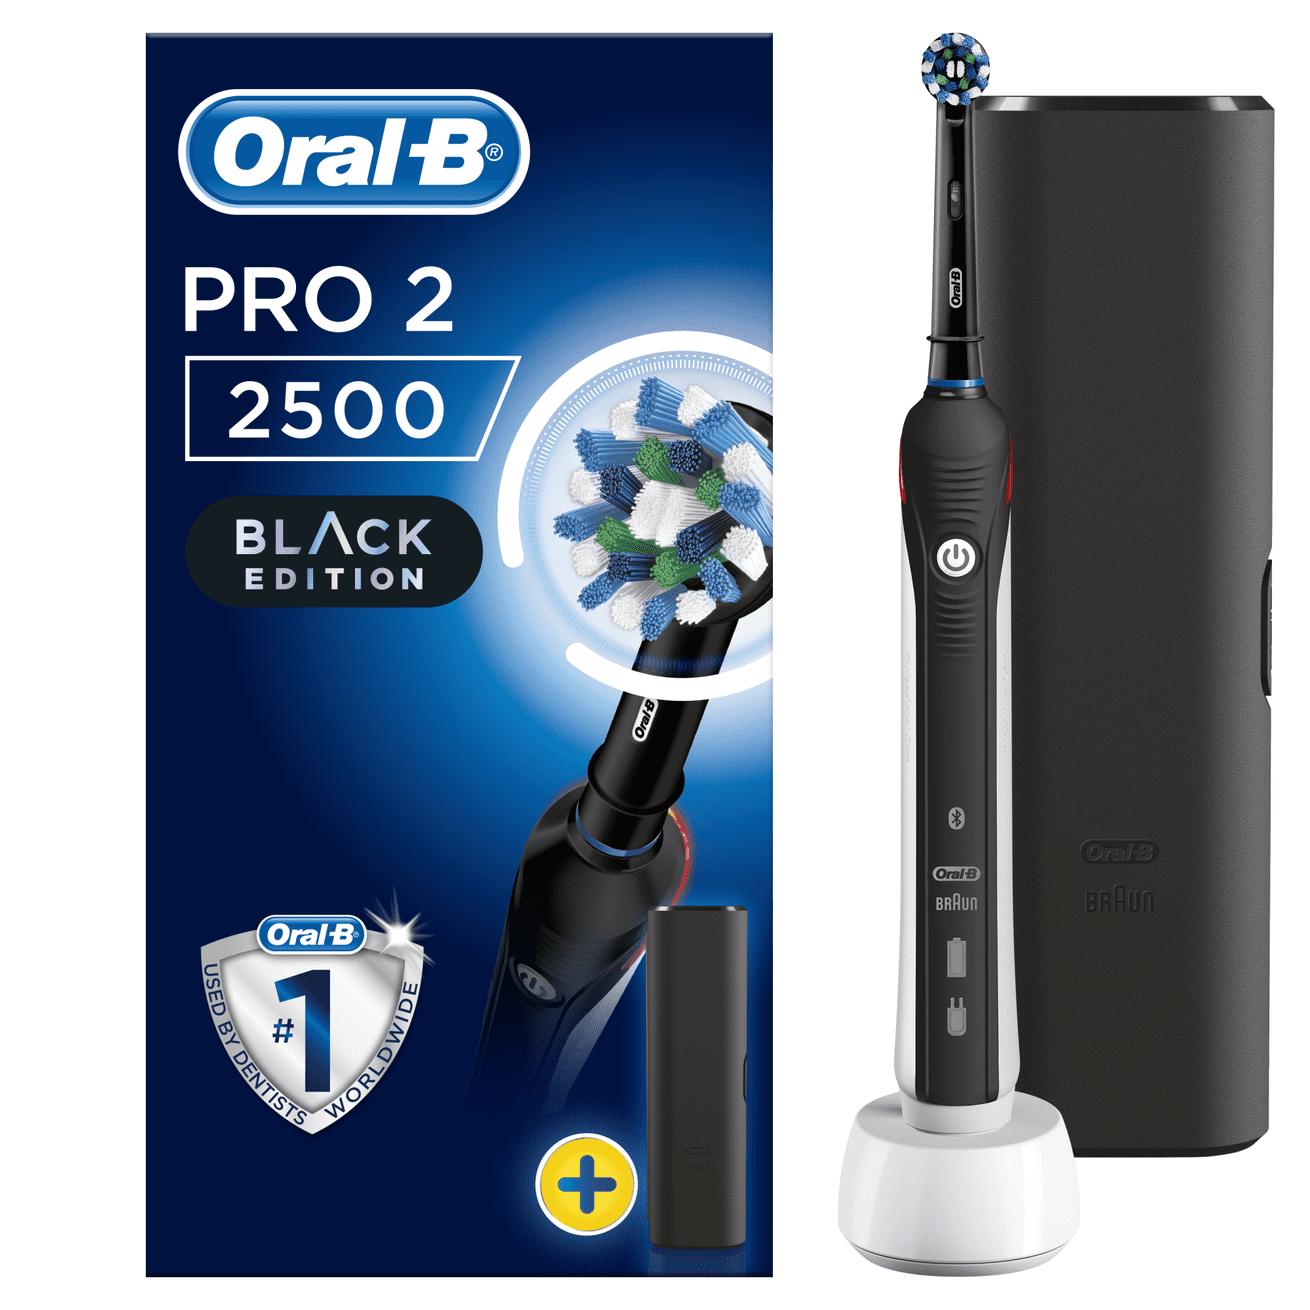 Oral-B Pro 2 2500 Black Edition Cross Action